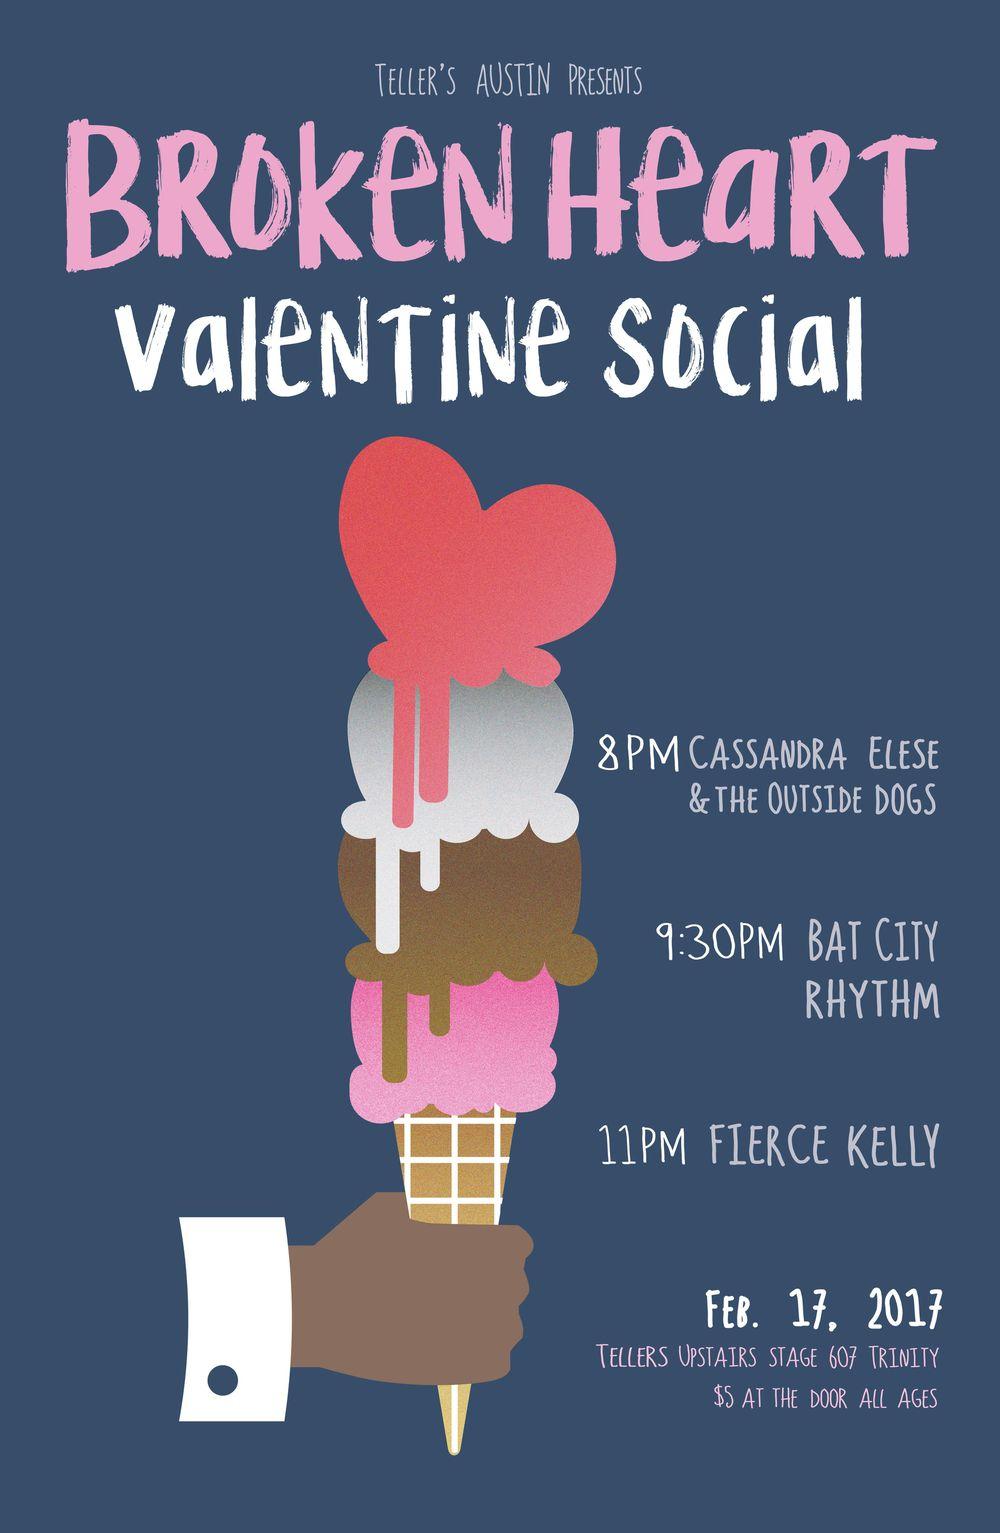 Broken Heart Valentine Social  - image 1 - student project